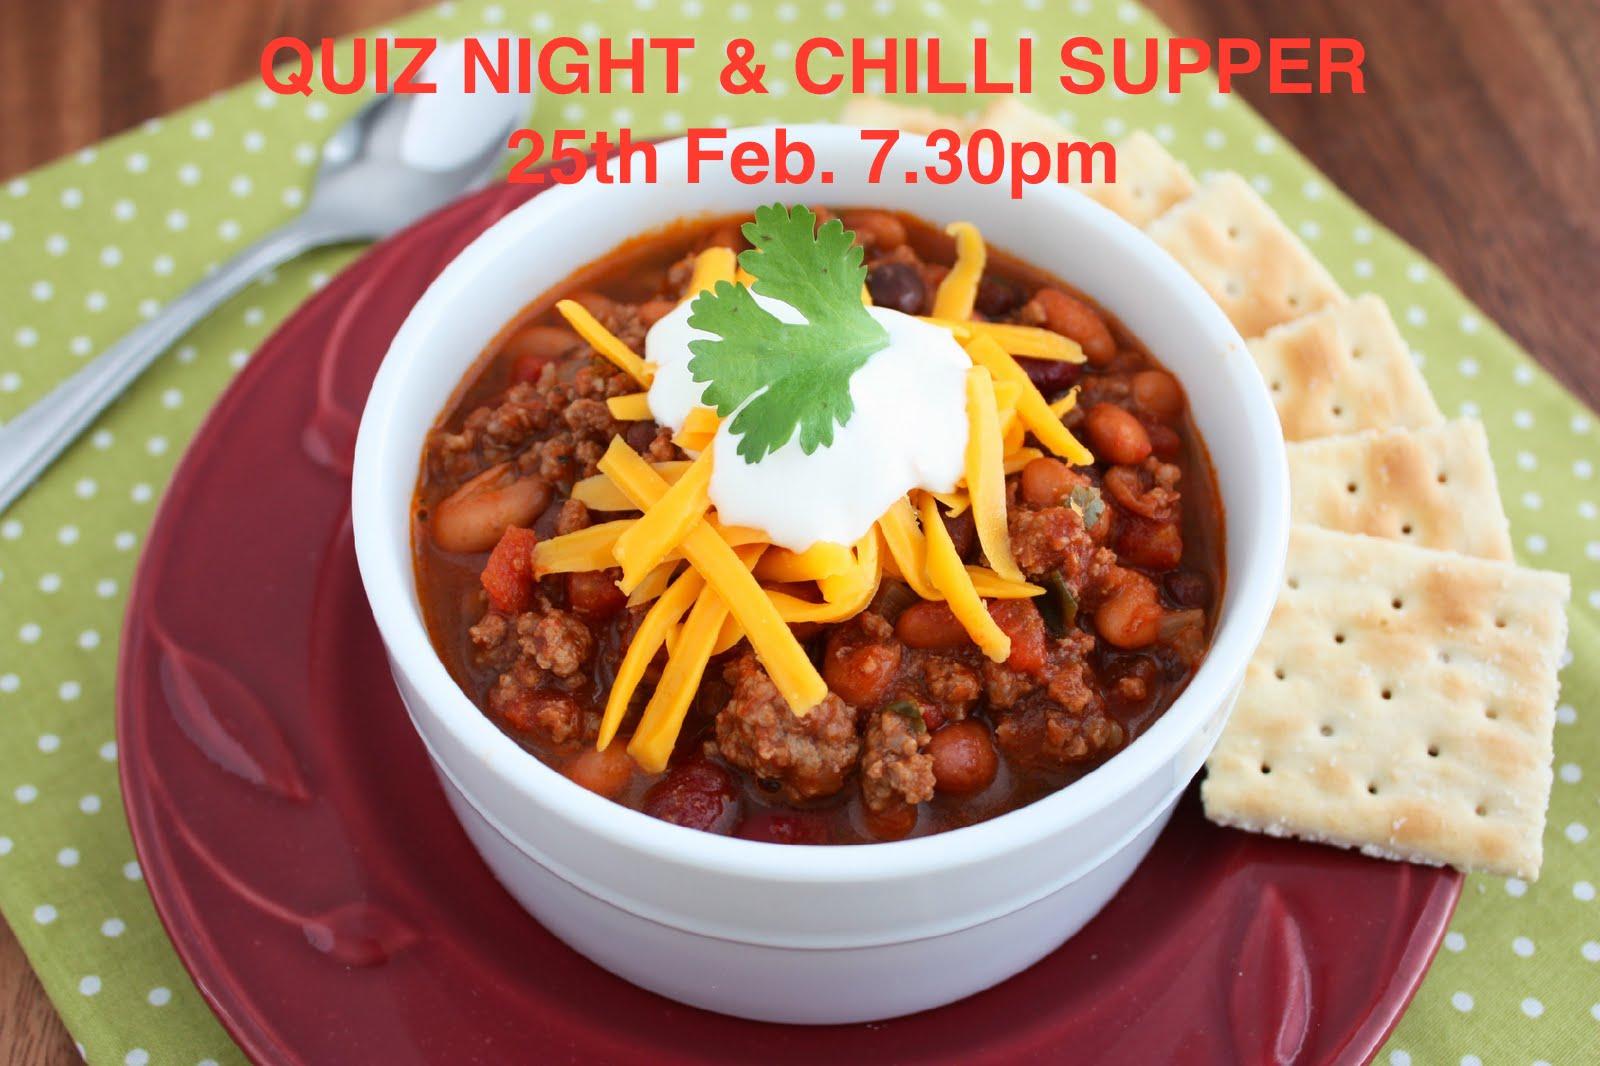 Quiz Night & Chilli Supper